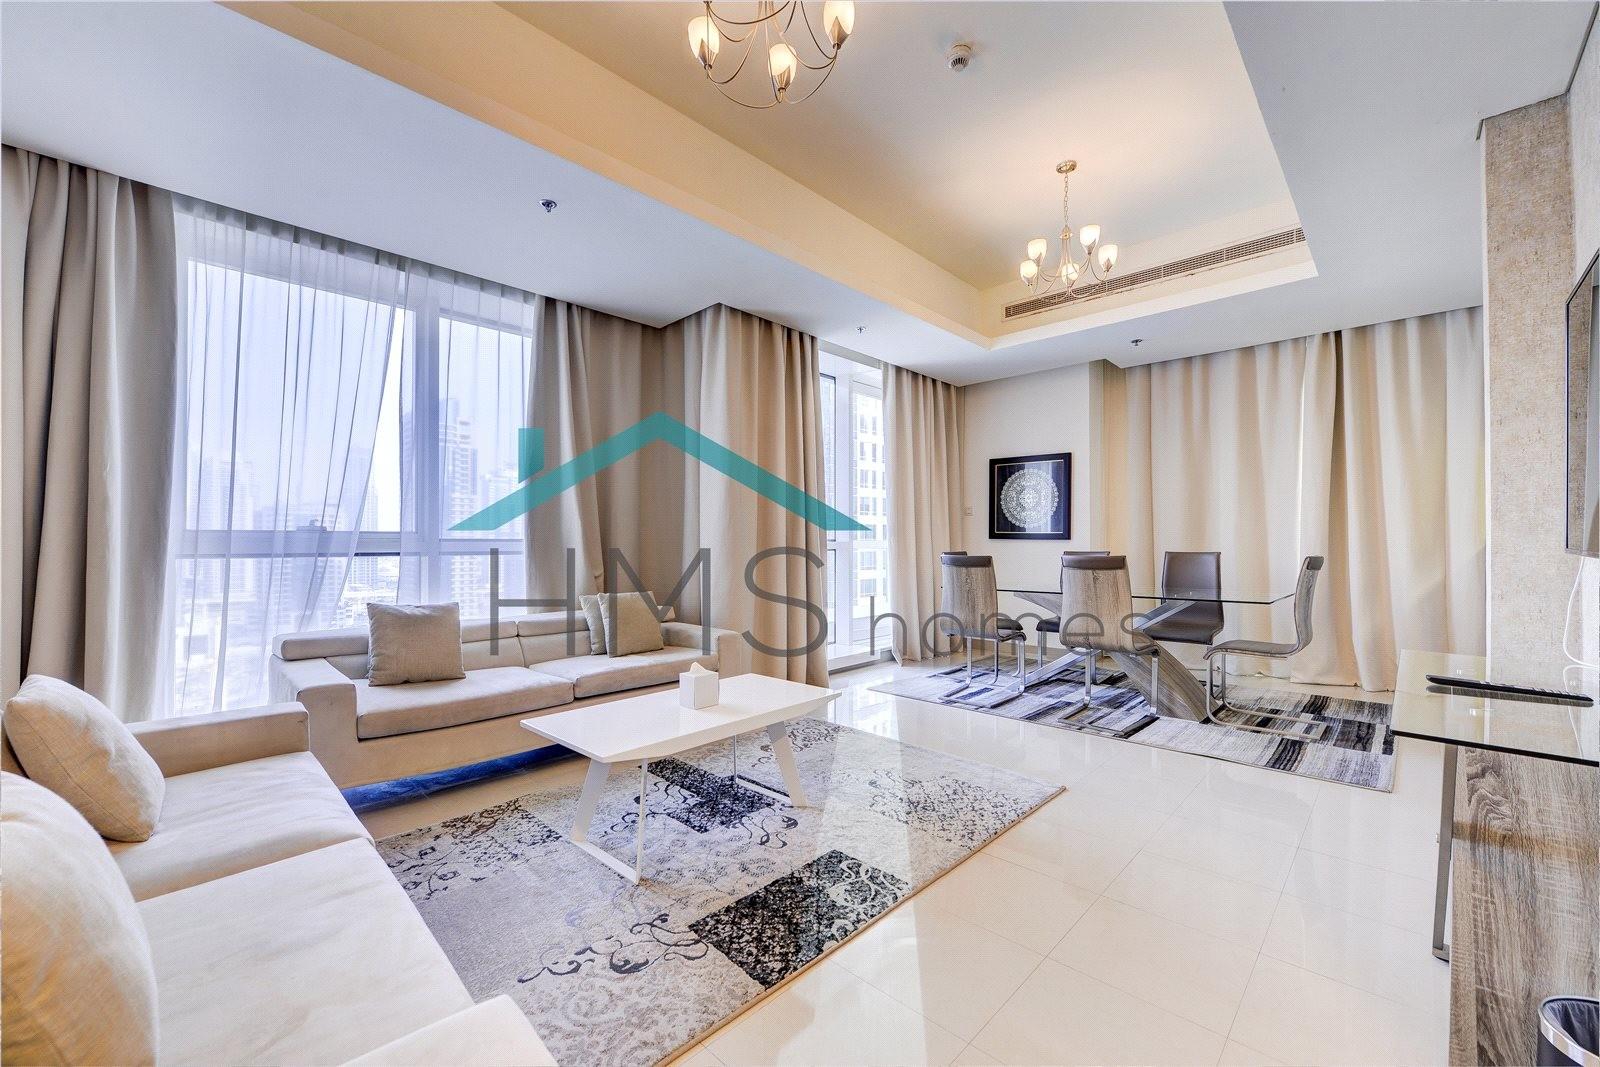 Stunning 2BR | Furnished | Barcelo Residence